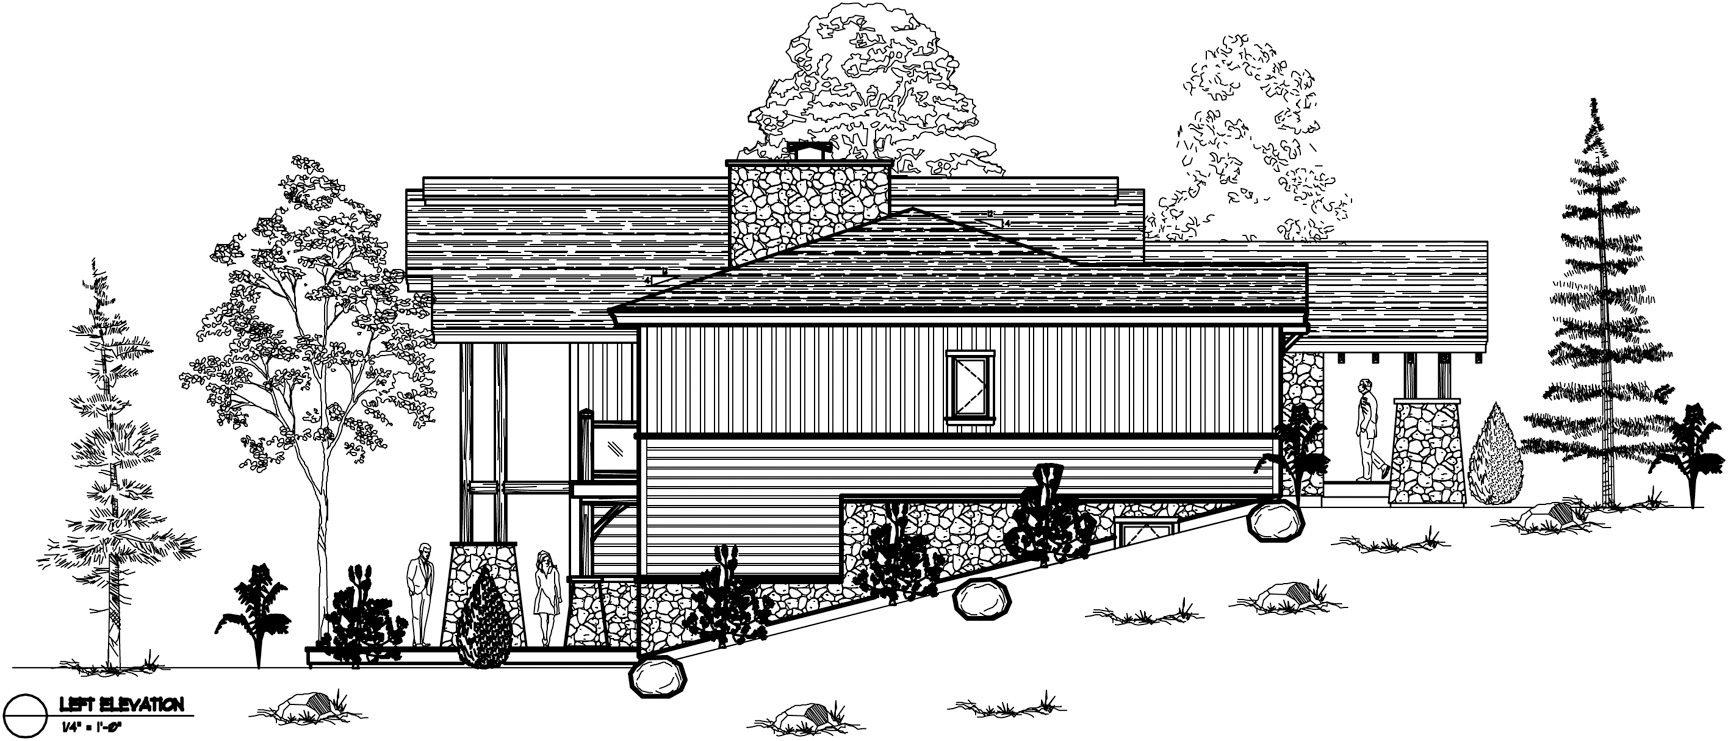 Normerica Timber Frames, House Plan, The Highrock 3579, Left Elevation